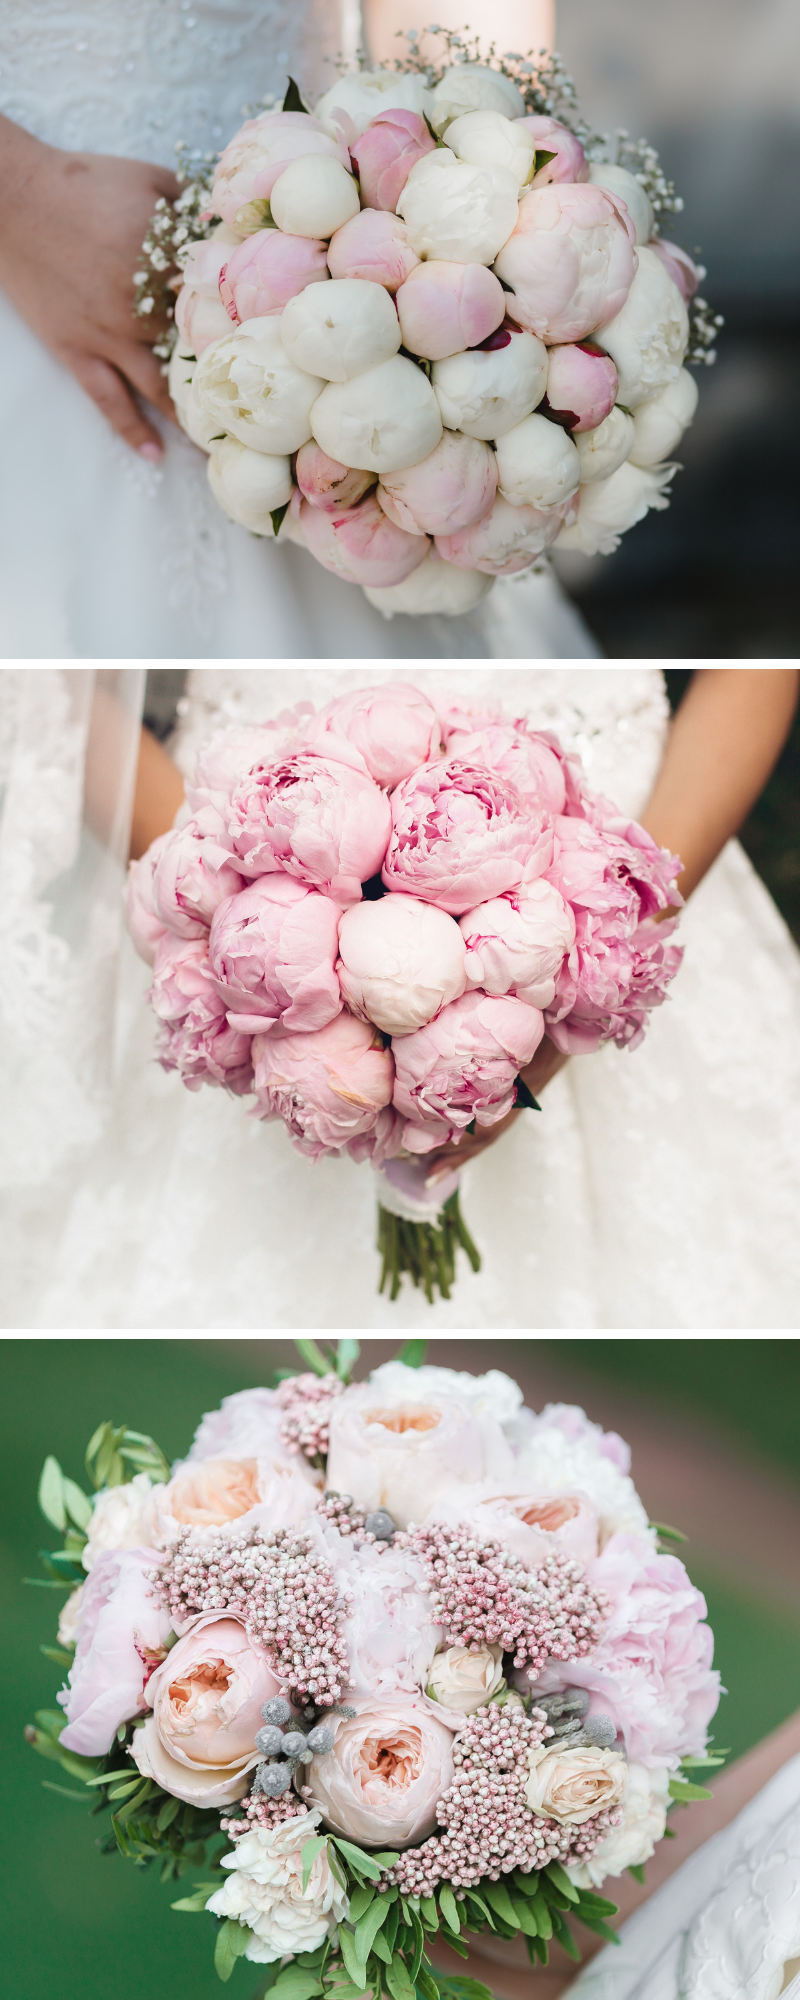 50 hermosas ideas de decoración de boda rosa – caja de boda